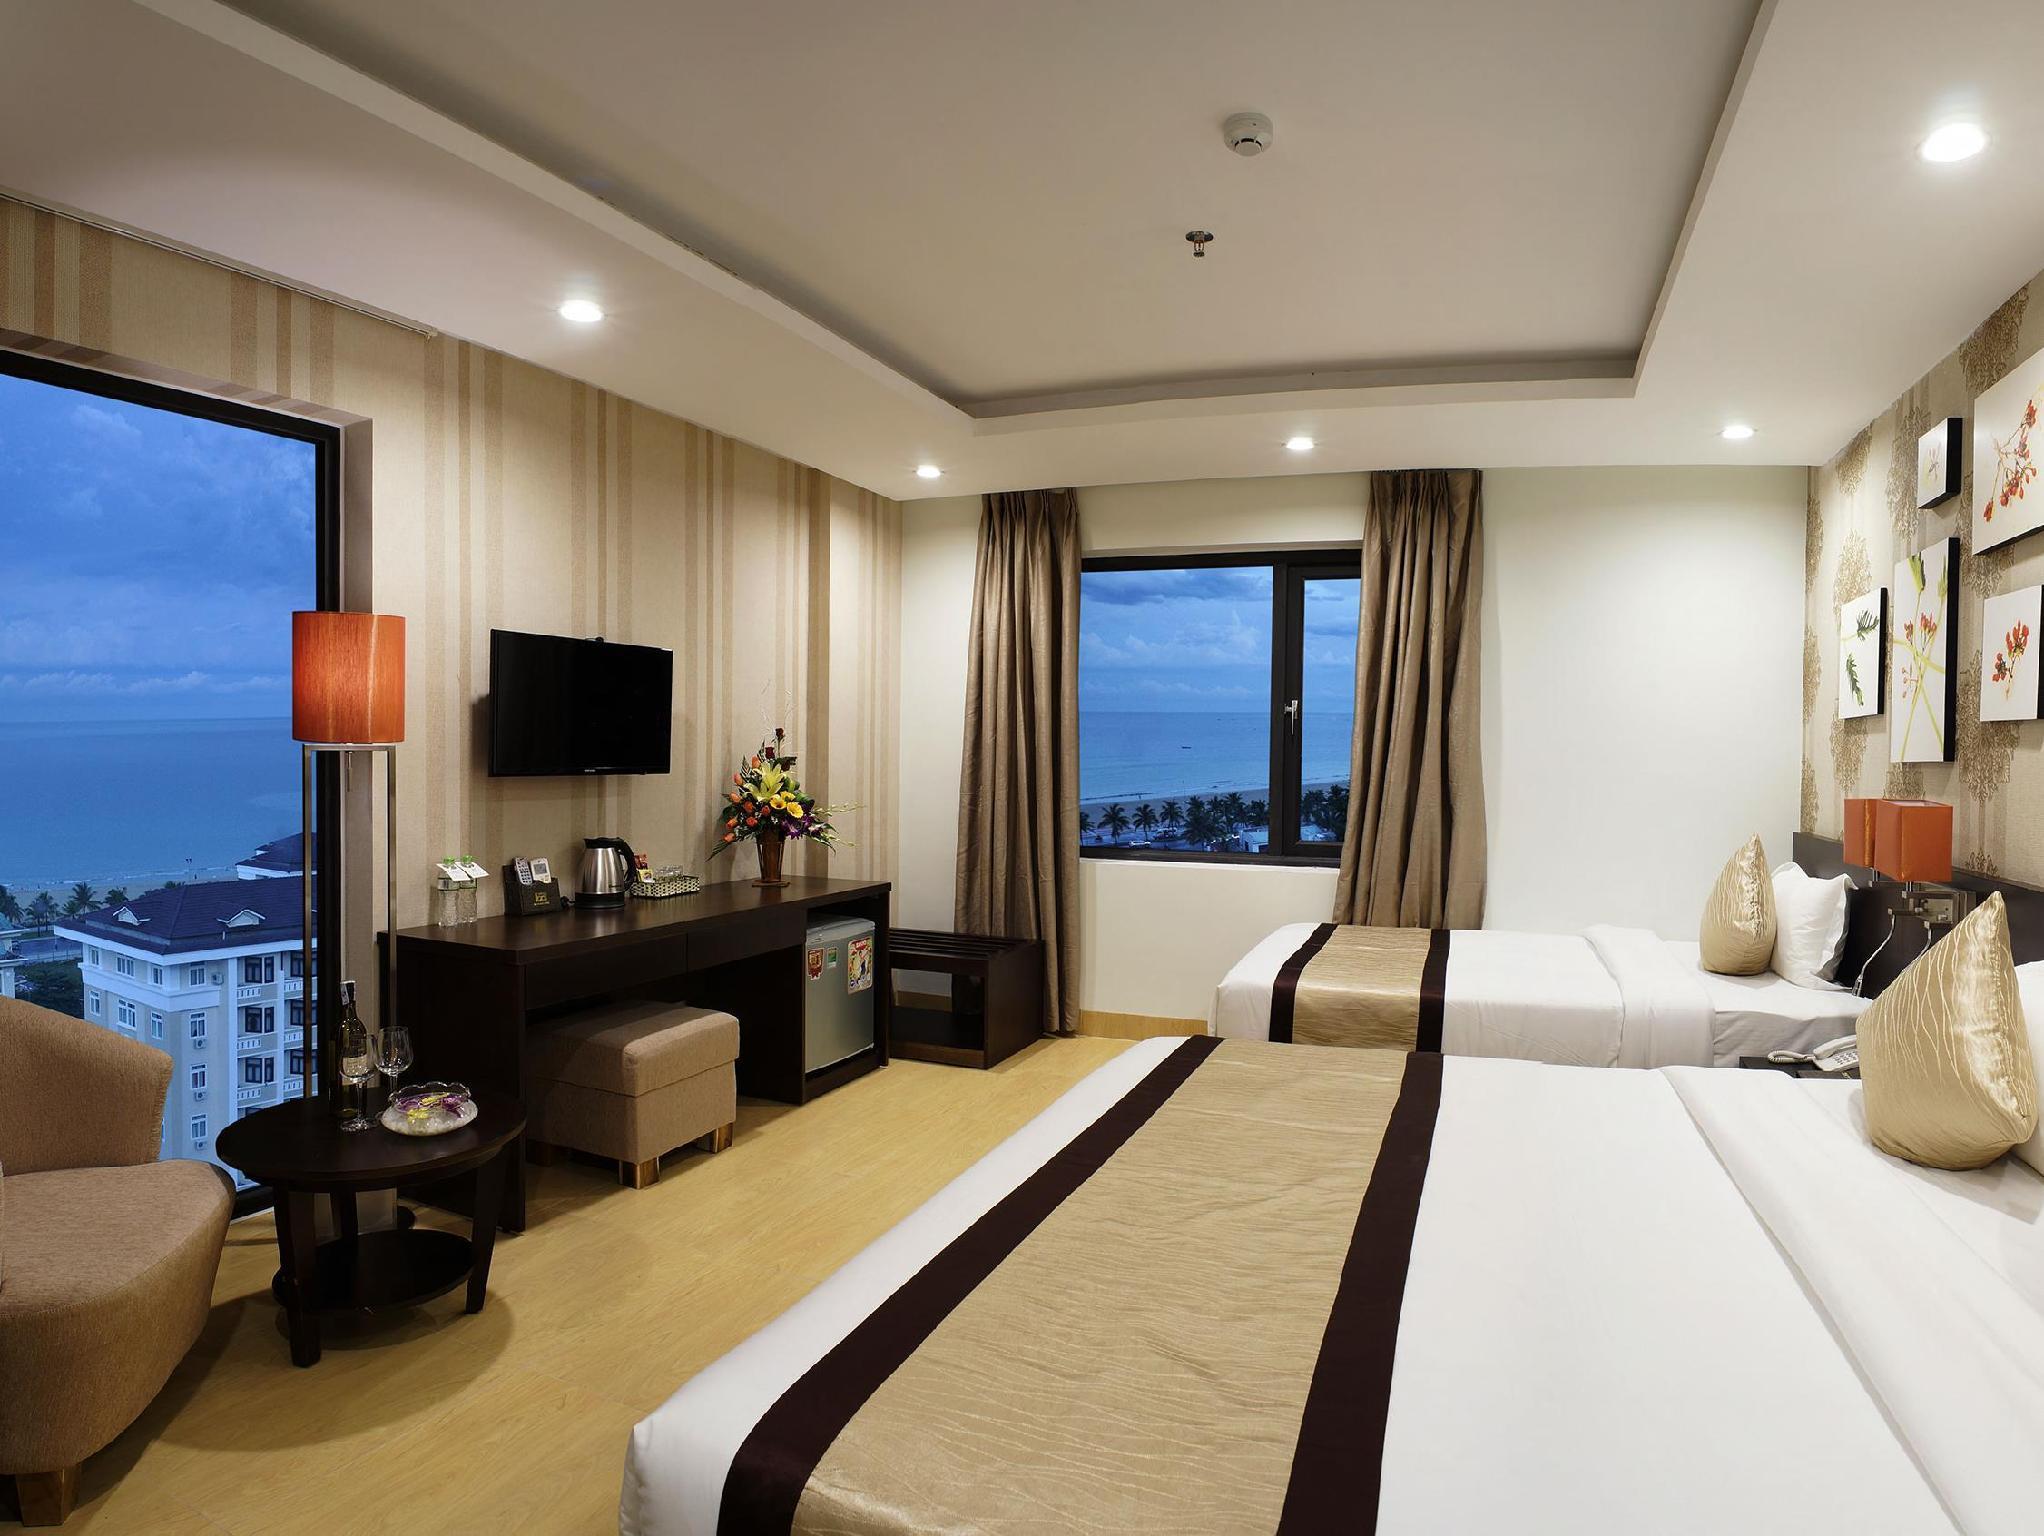 Bac Cuong Hotel